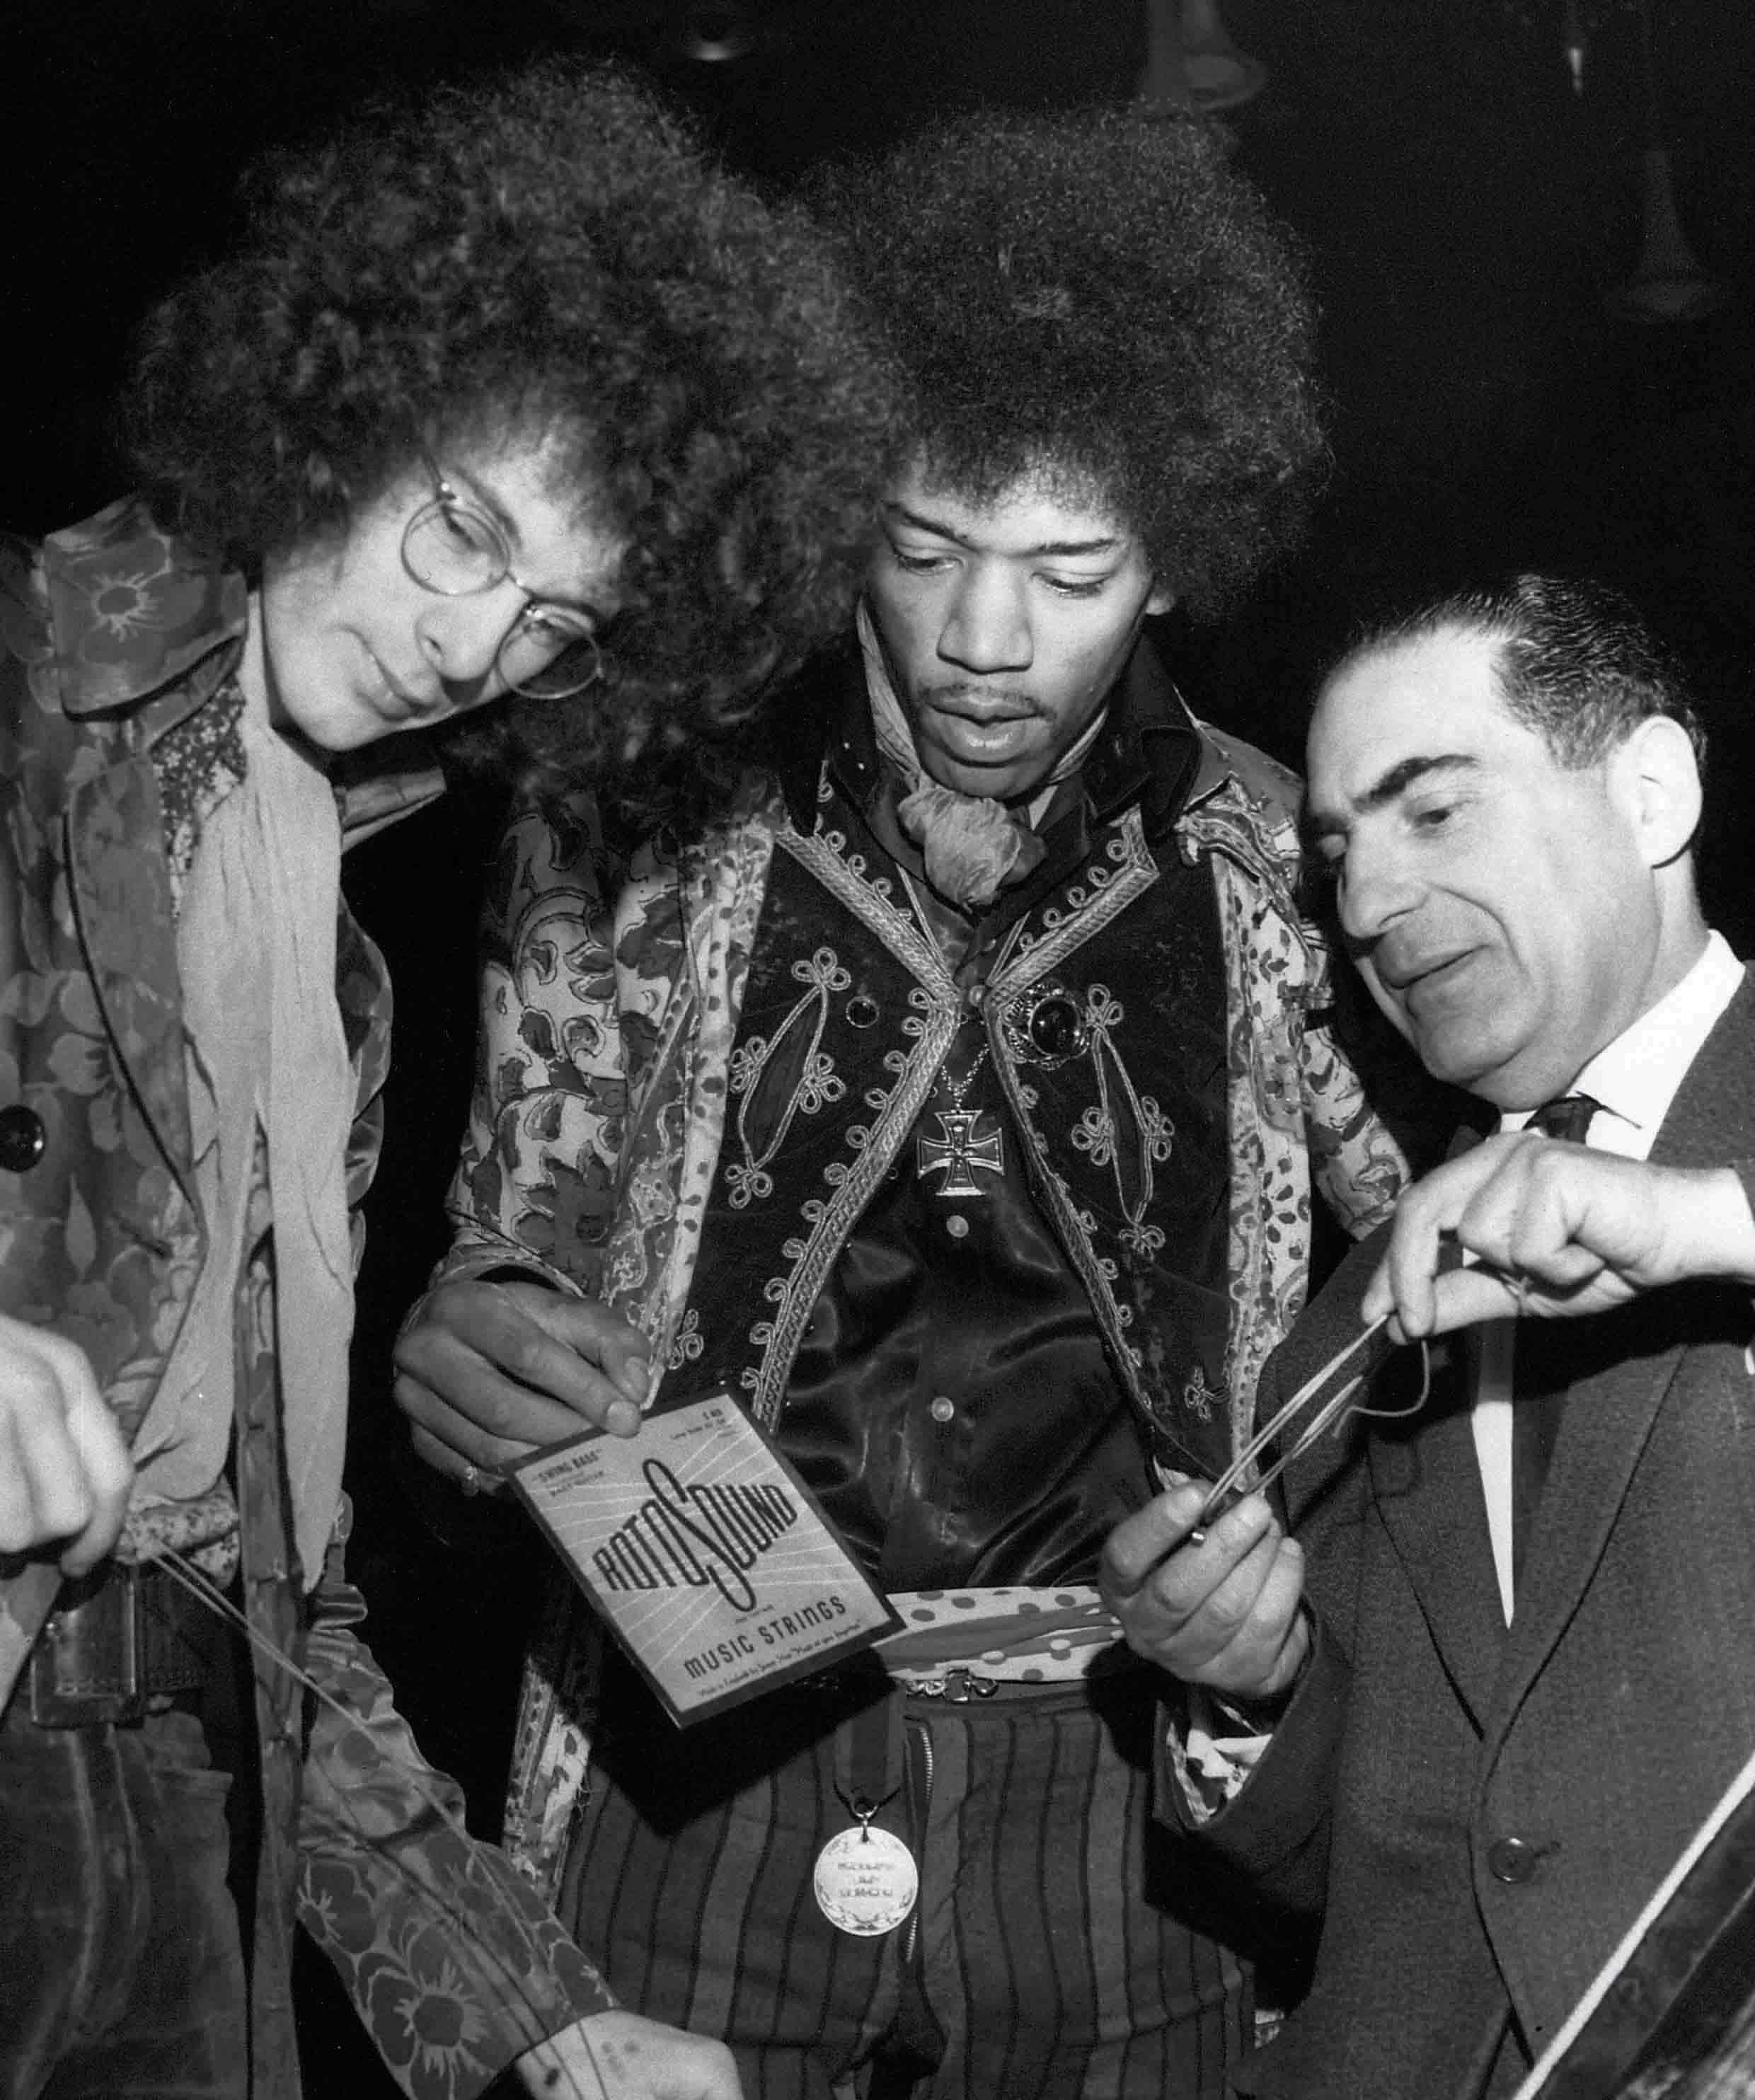 Jimi  Hendrix's guitar string gauges-jimi-hendrix-noel-redding-alan-marcuson-rotosound-guitar-strings_purley-orchid-ballroom-march-1s-jpg